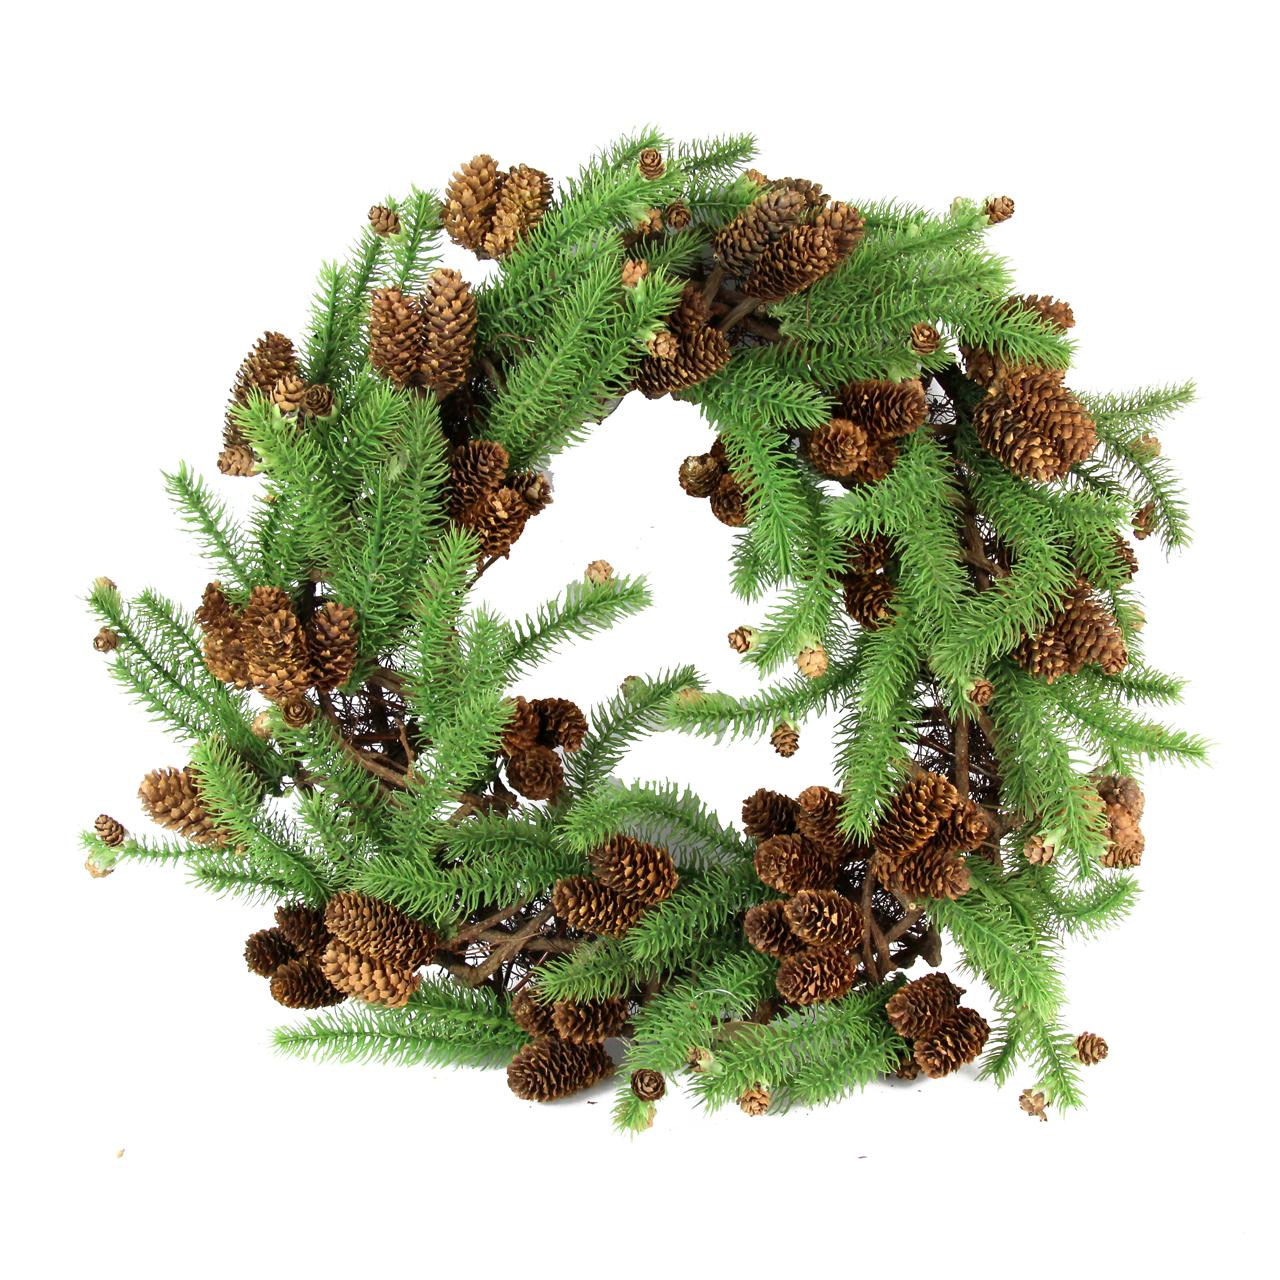 Coronita Din Lemn Si Plastic Verde Cu Maro 48 Cm